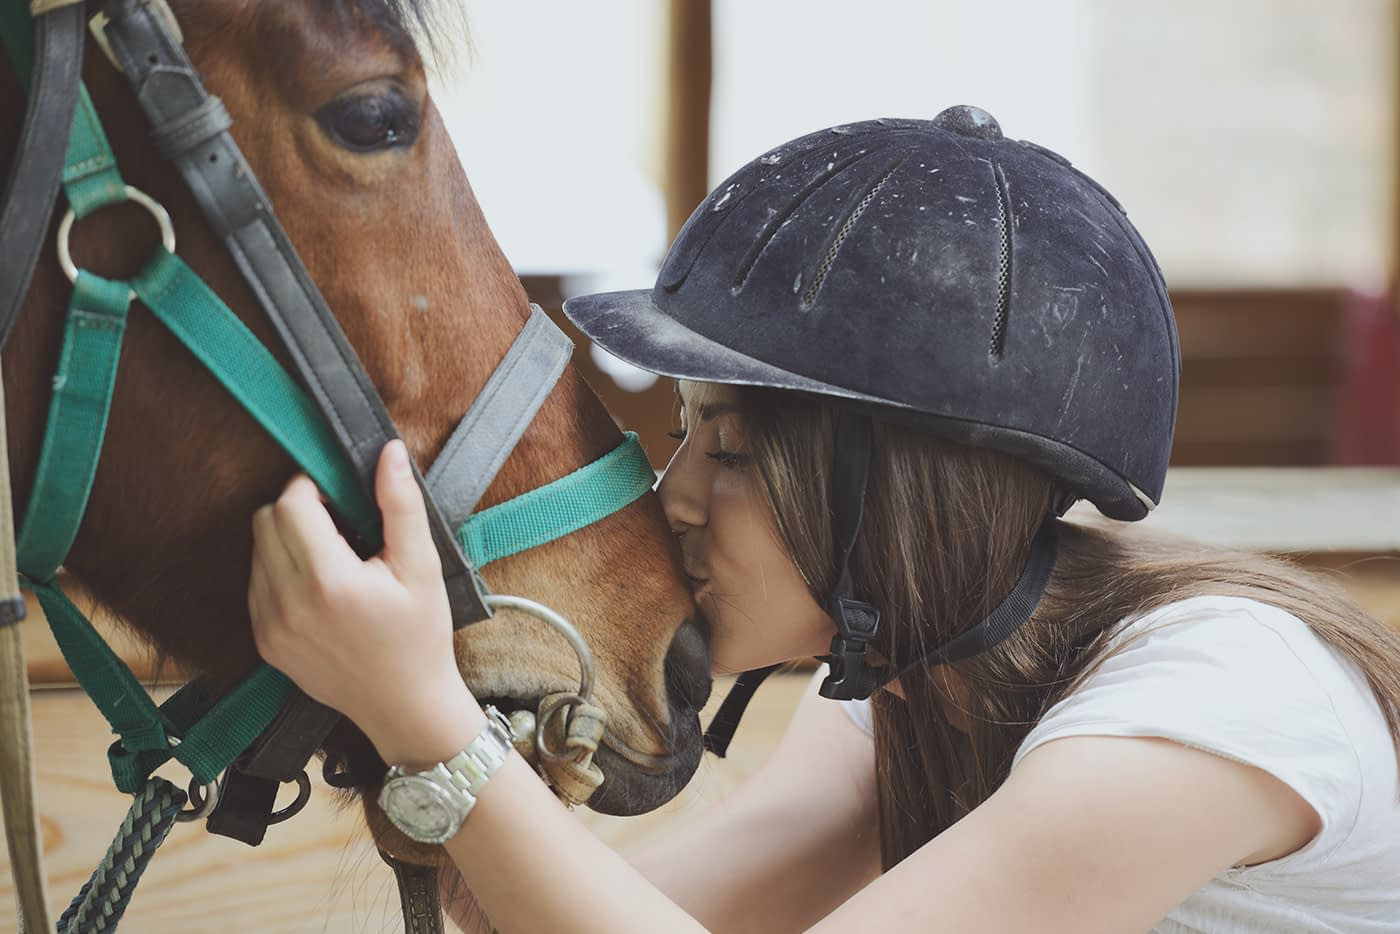 equestrian warredal